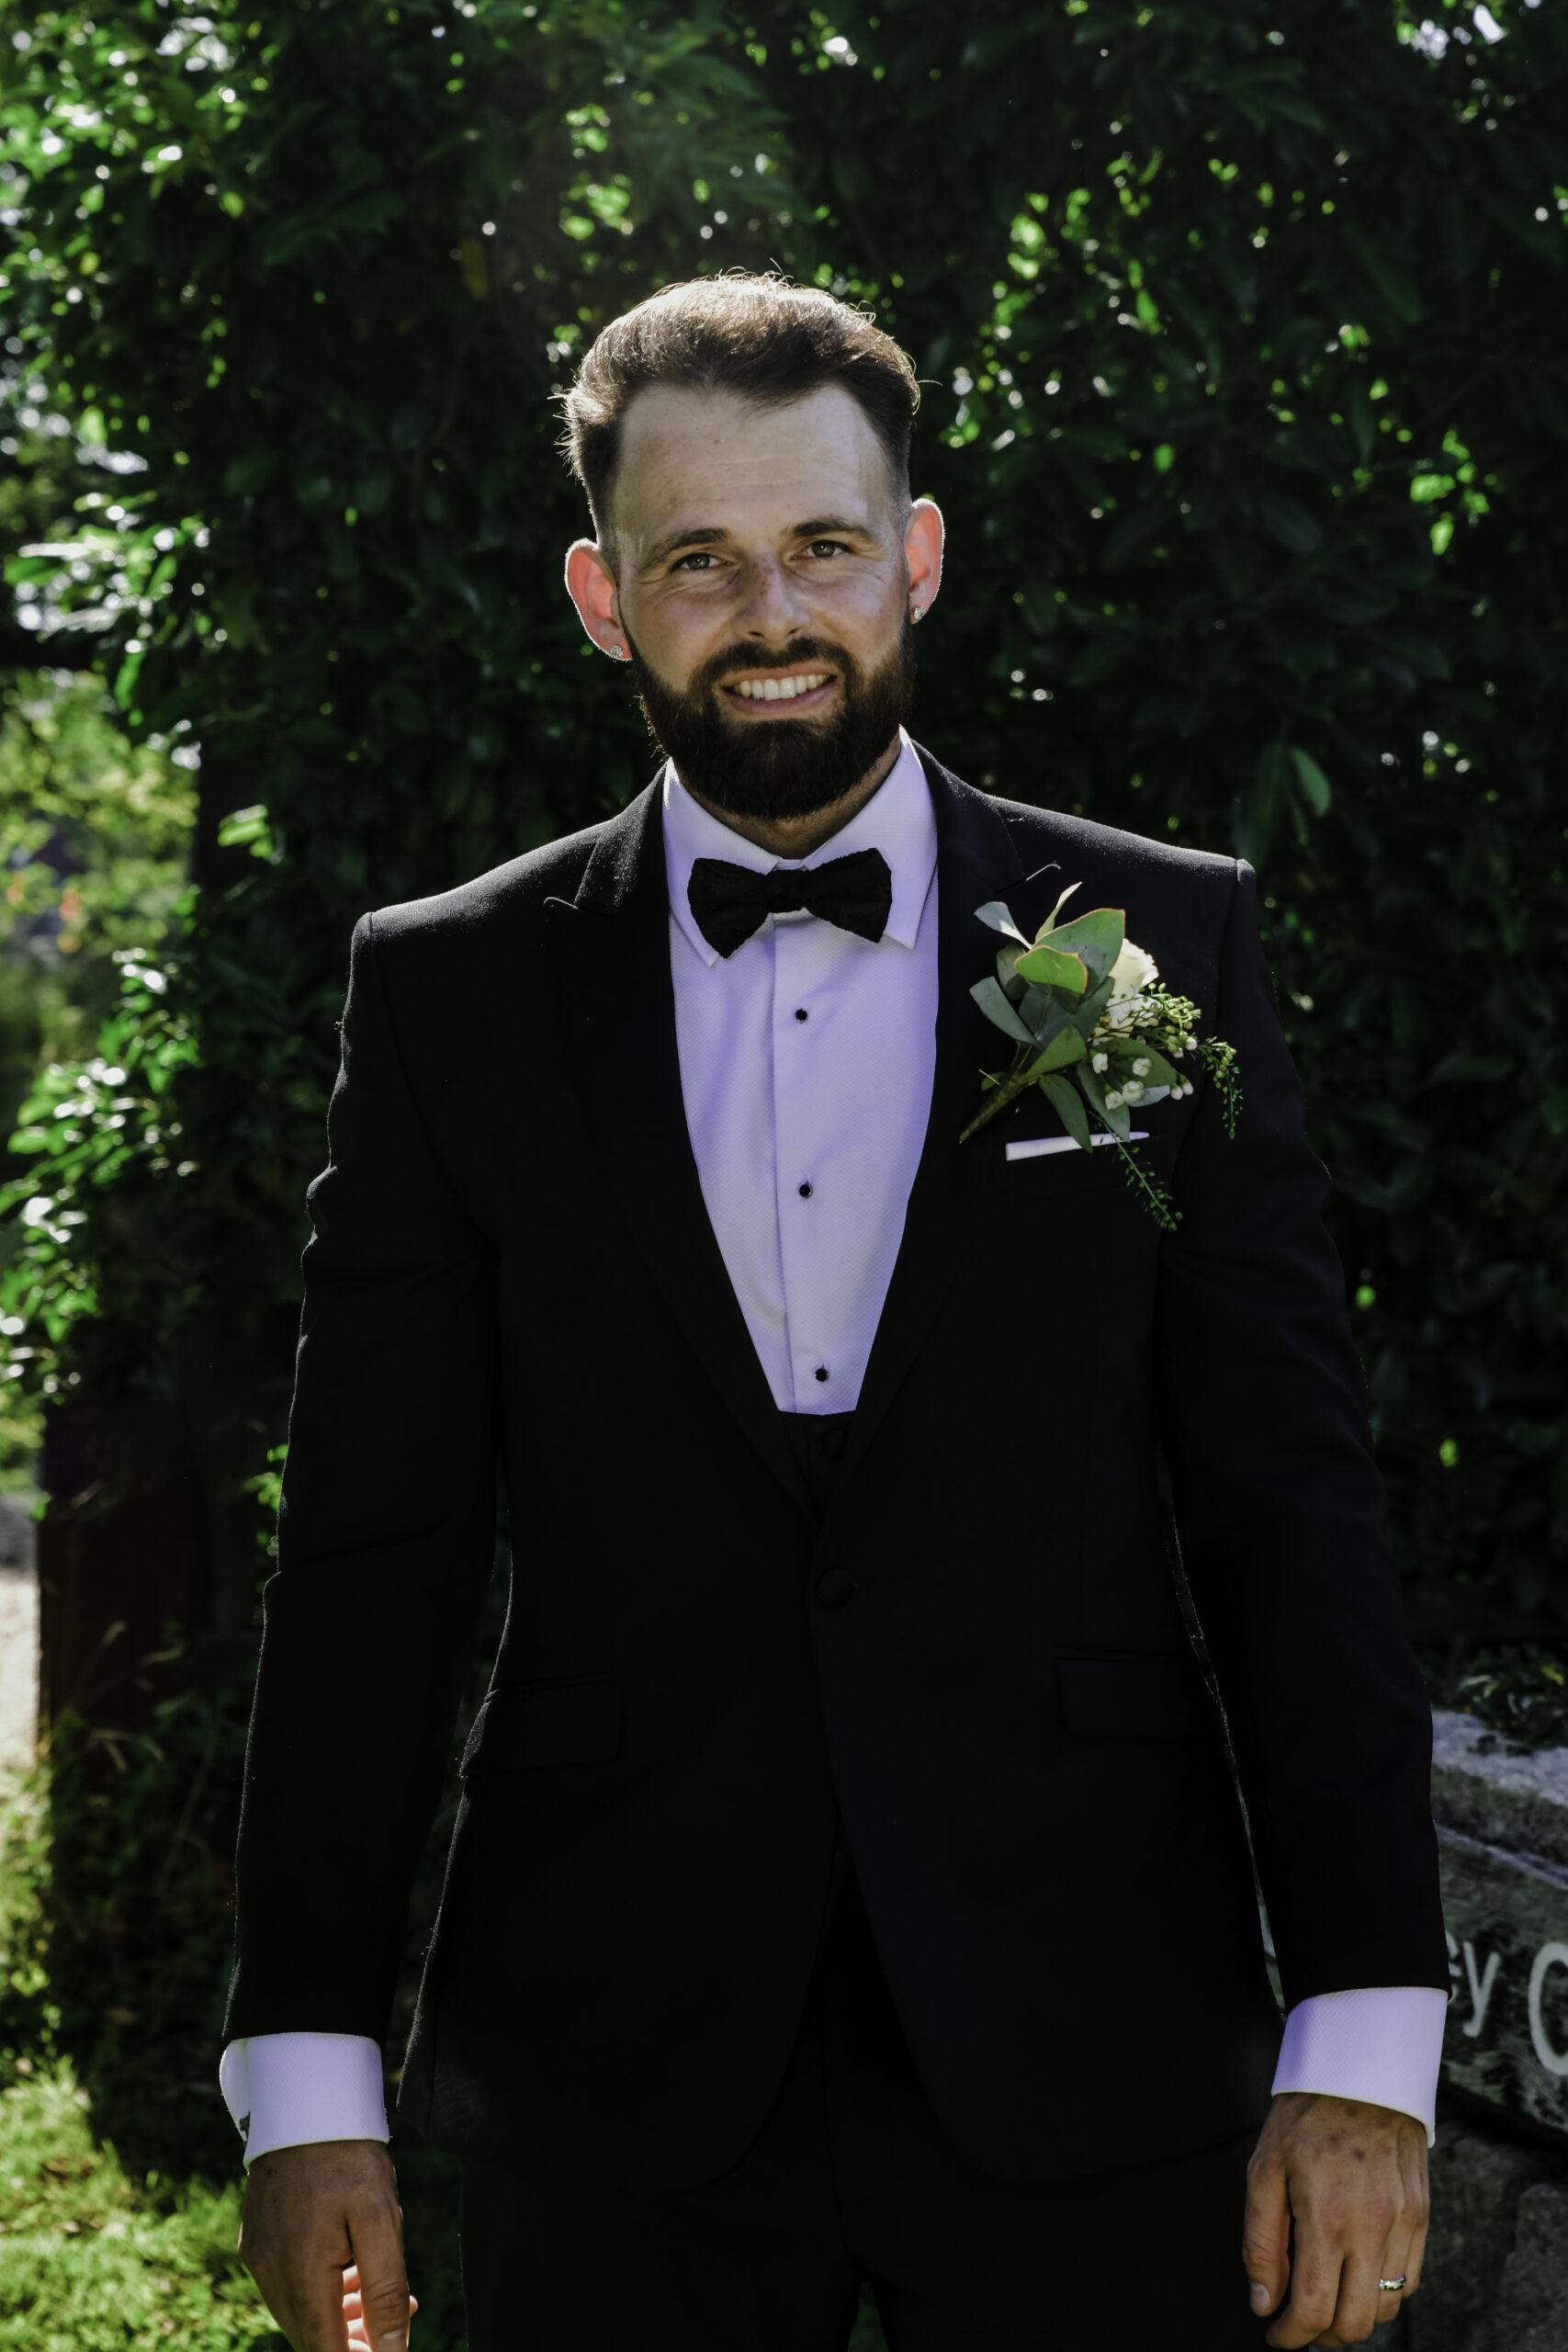 Wedding Photography at Shenley Cricket Club